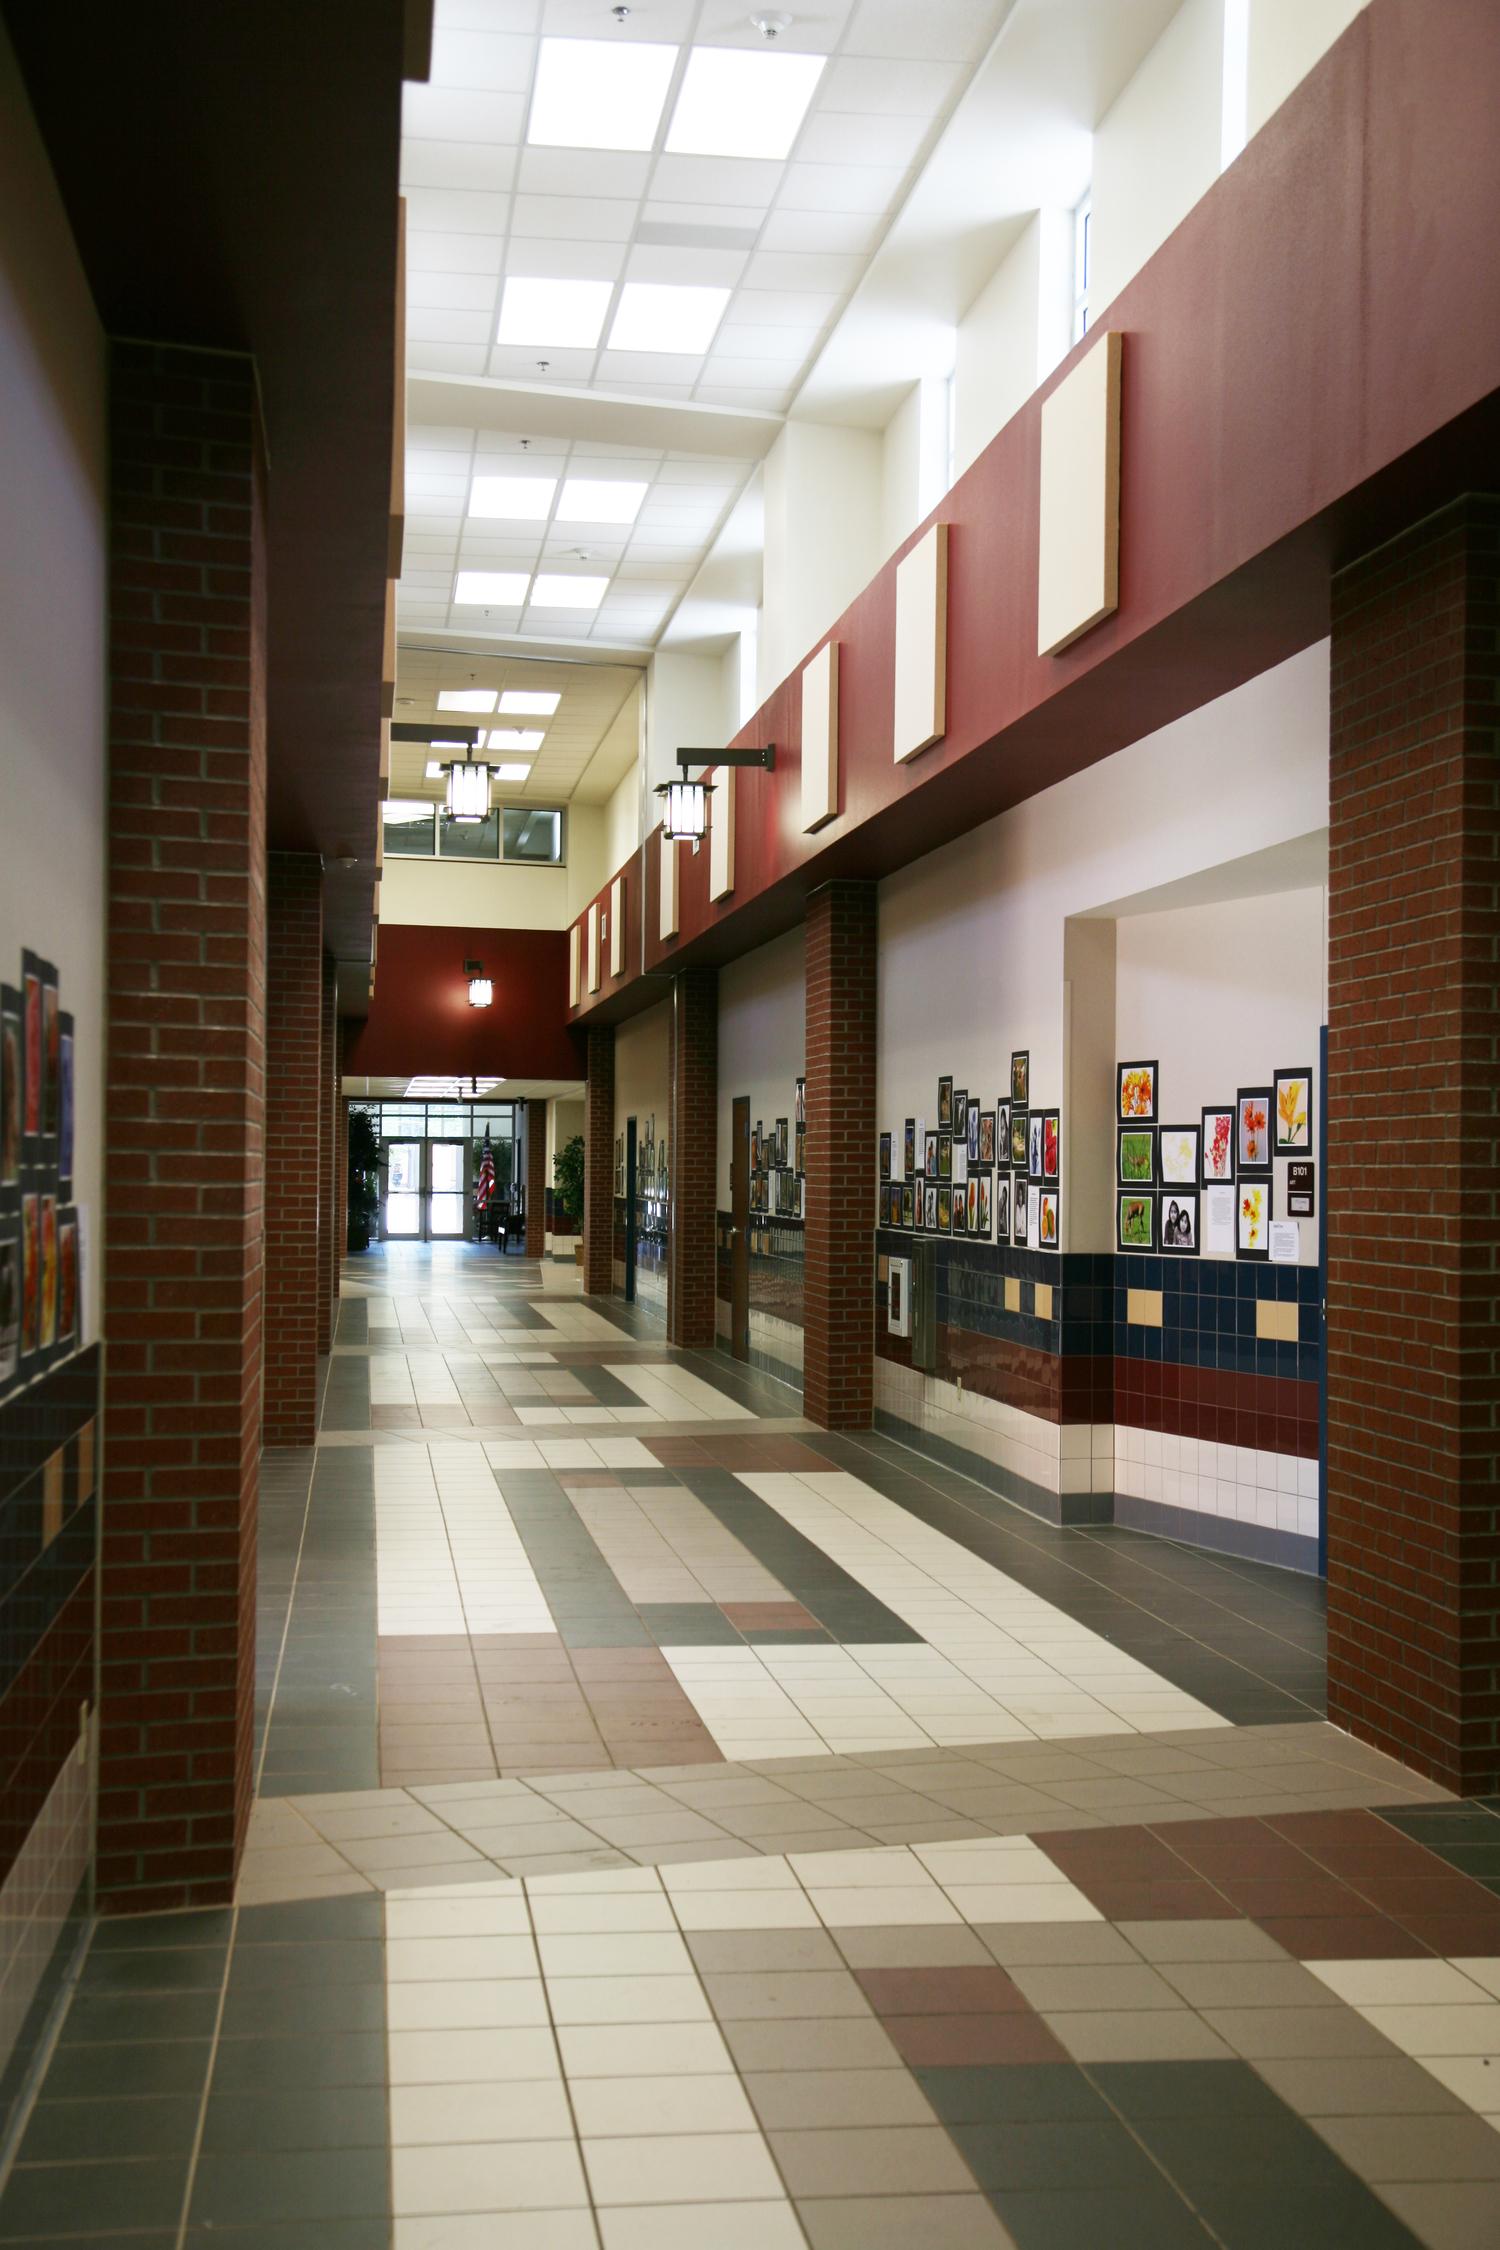 tisd austin elementary - elementary school architect east texas - architect for education tyler - butler architectural group